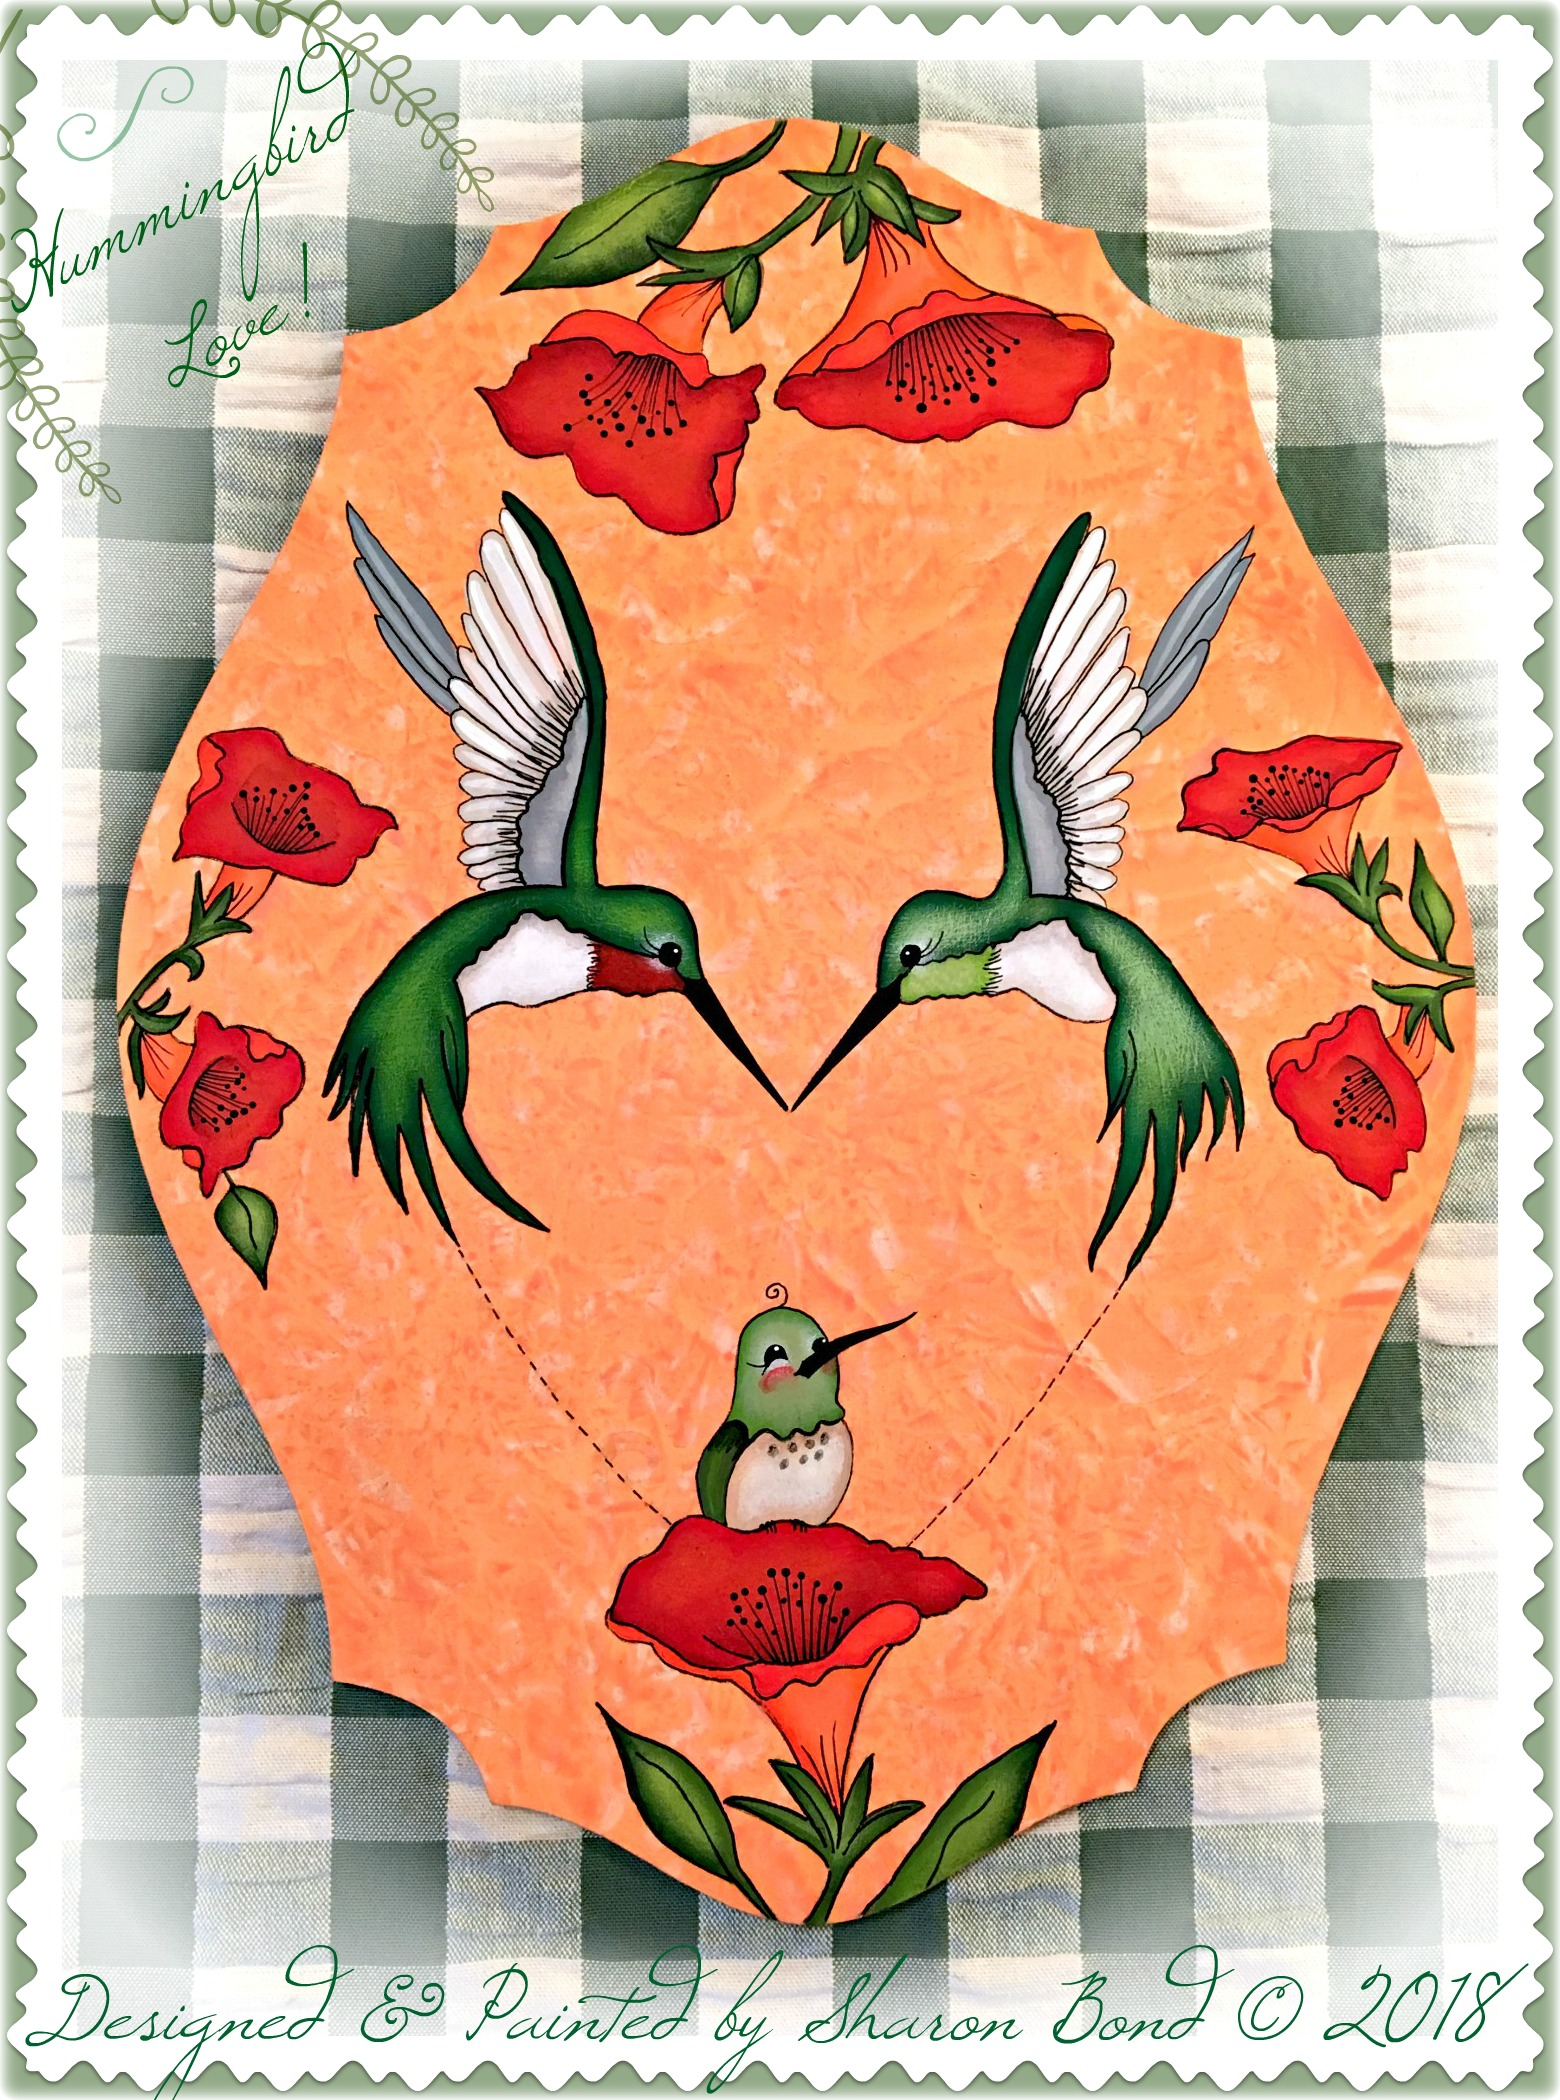 Hummingbird Love! - E-Packet - Sharon Bond